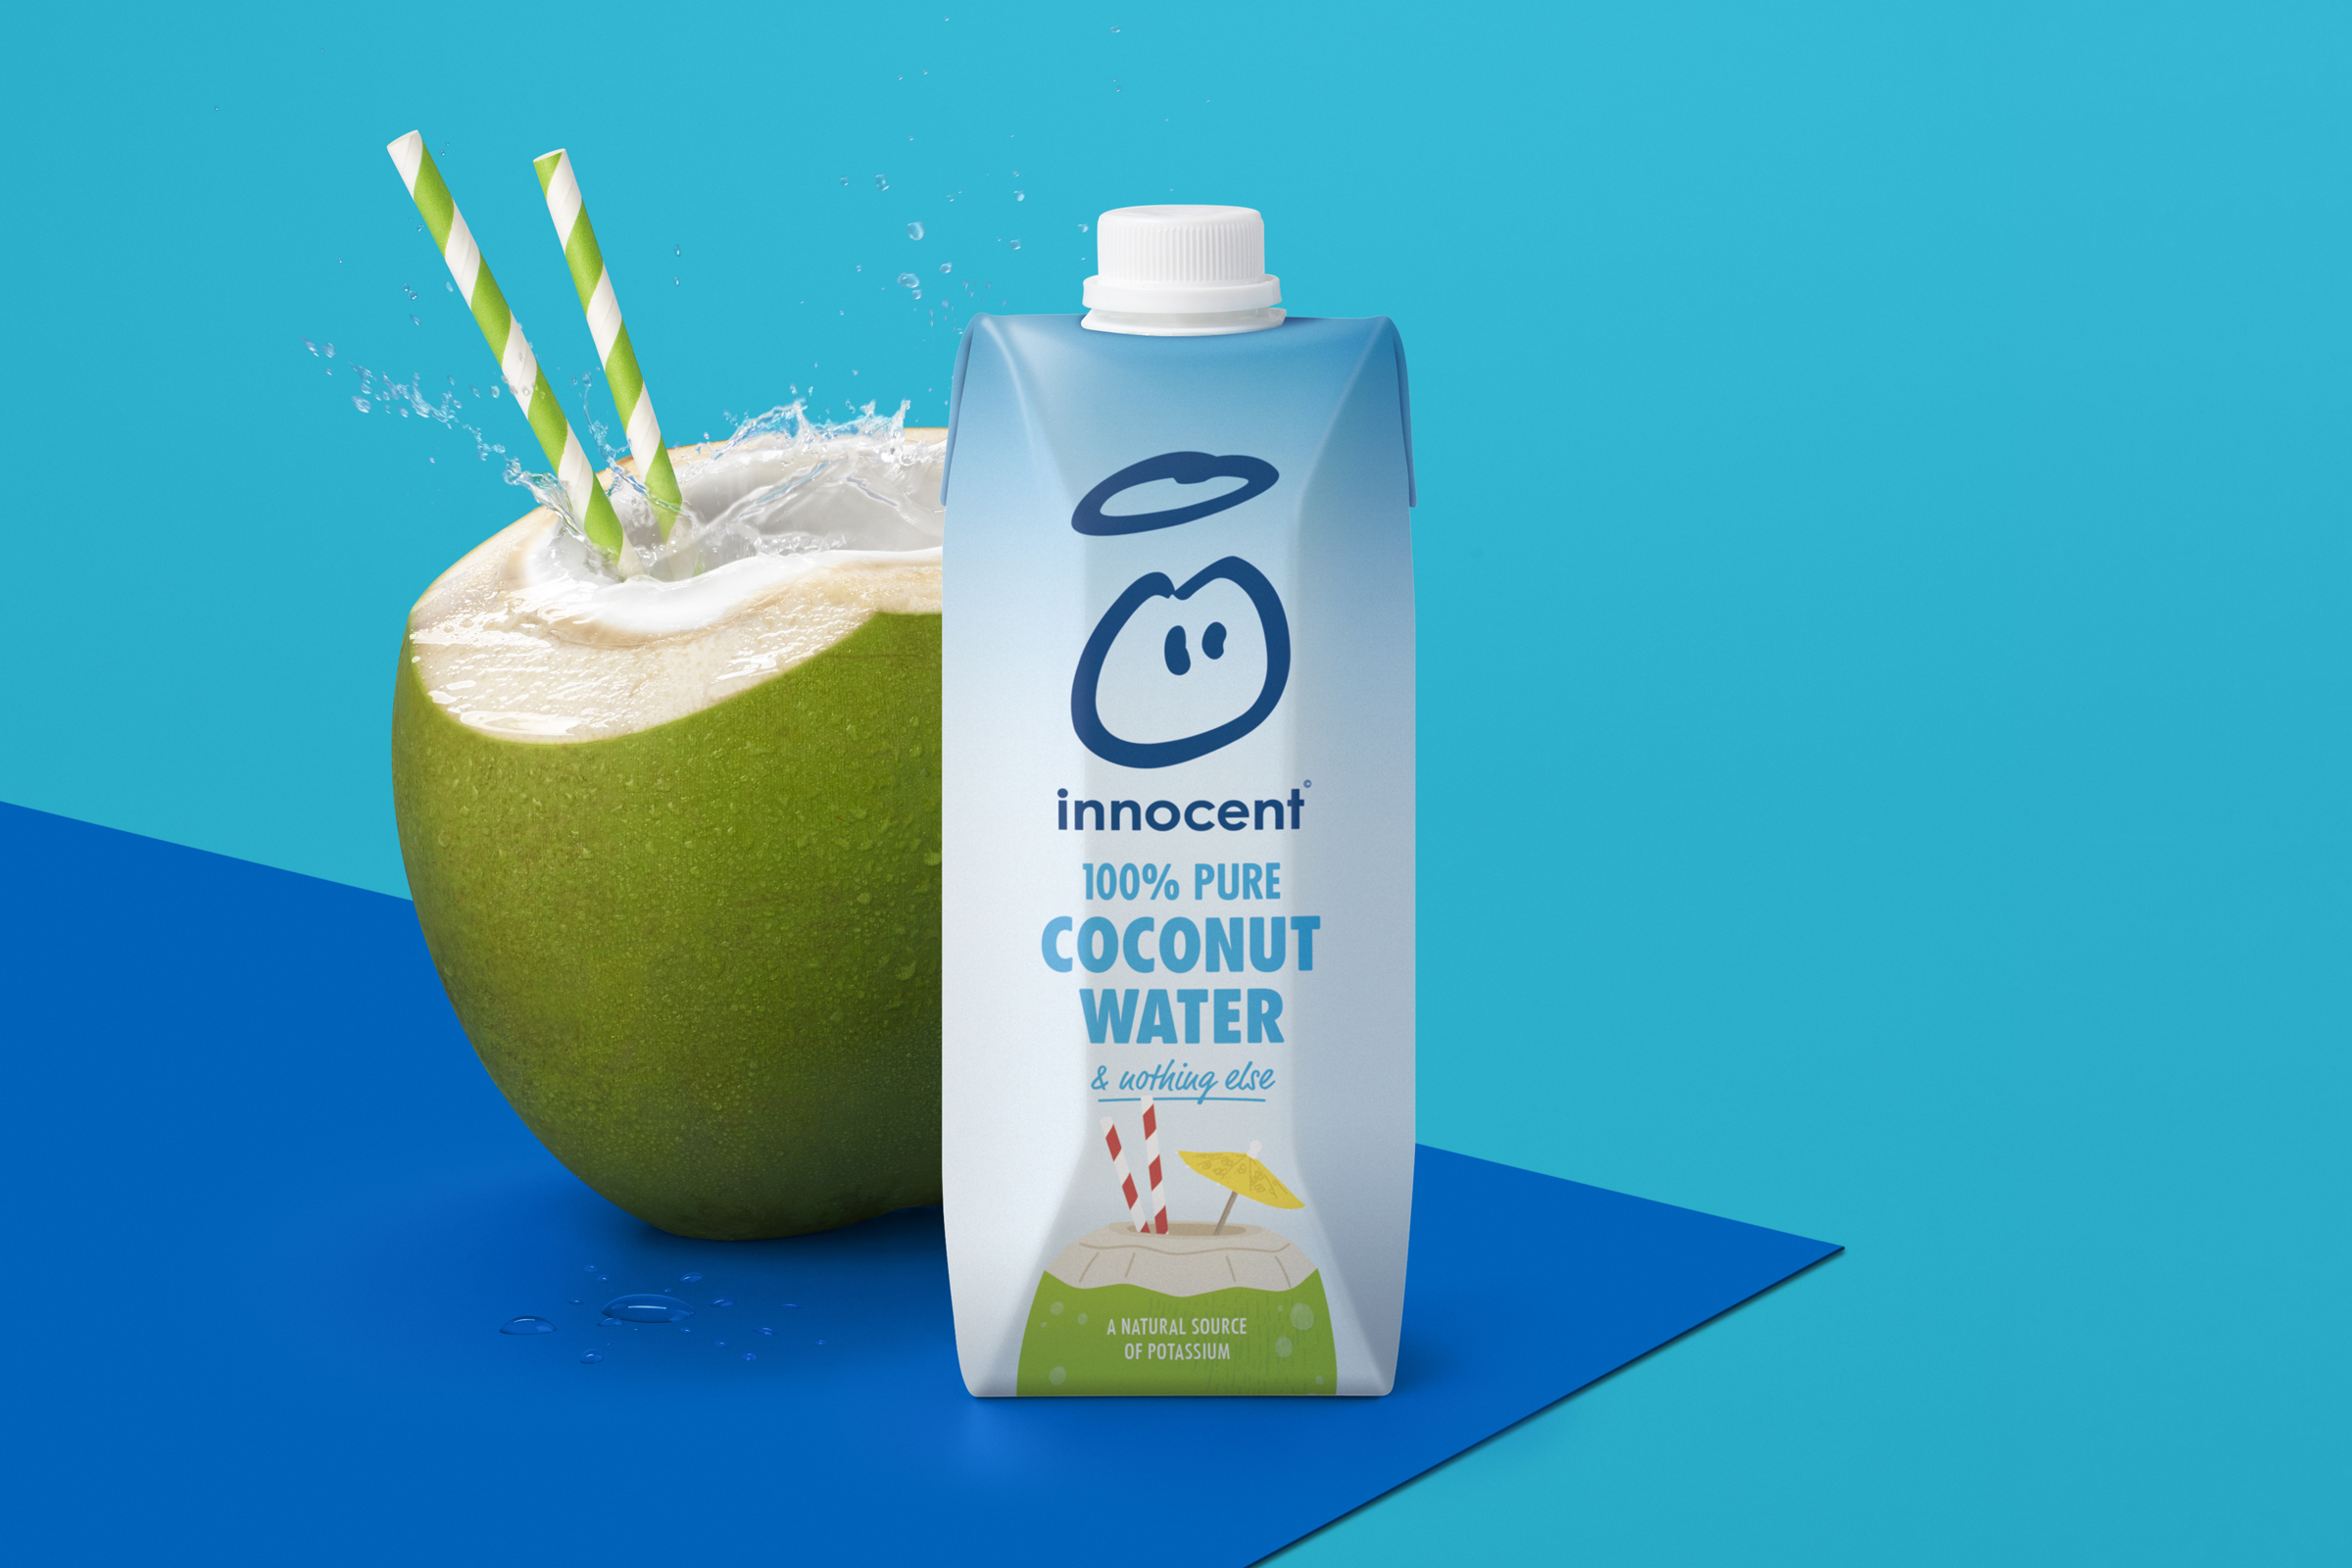 innocent-coconut-water-500ml.jpg